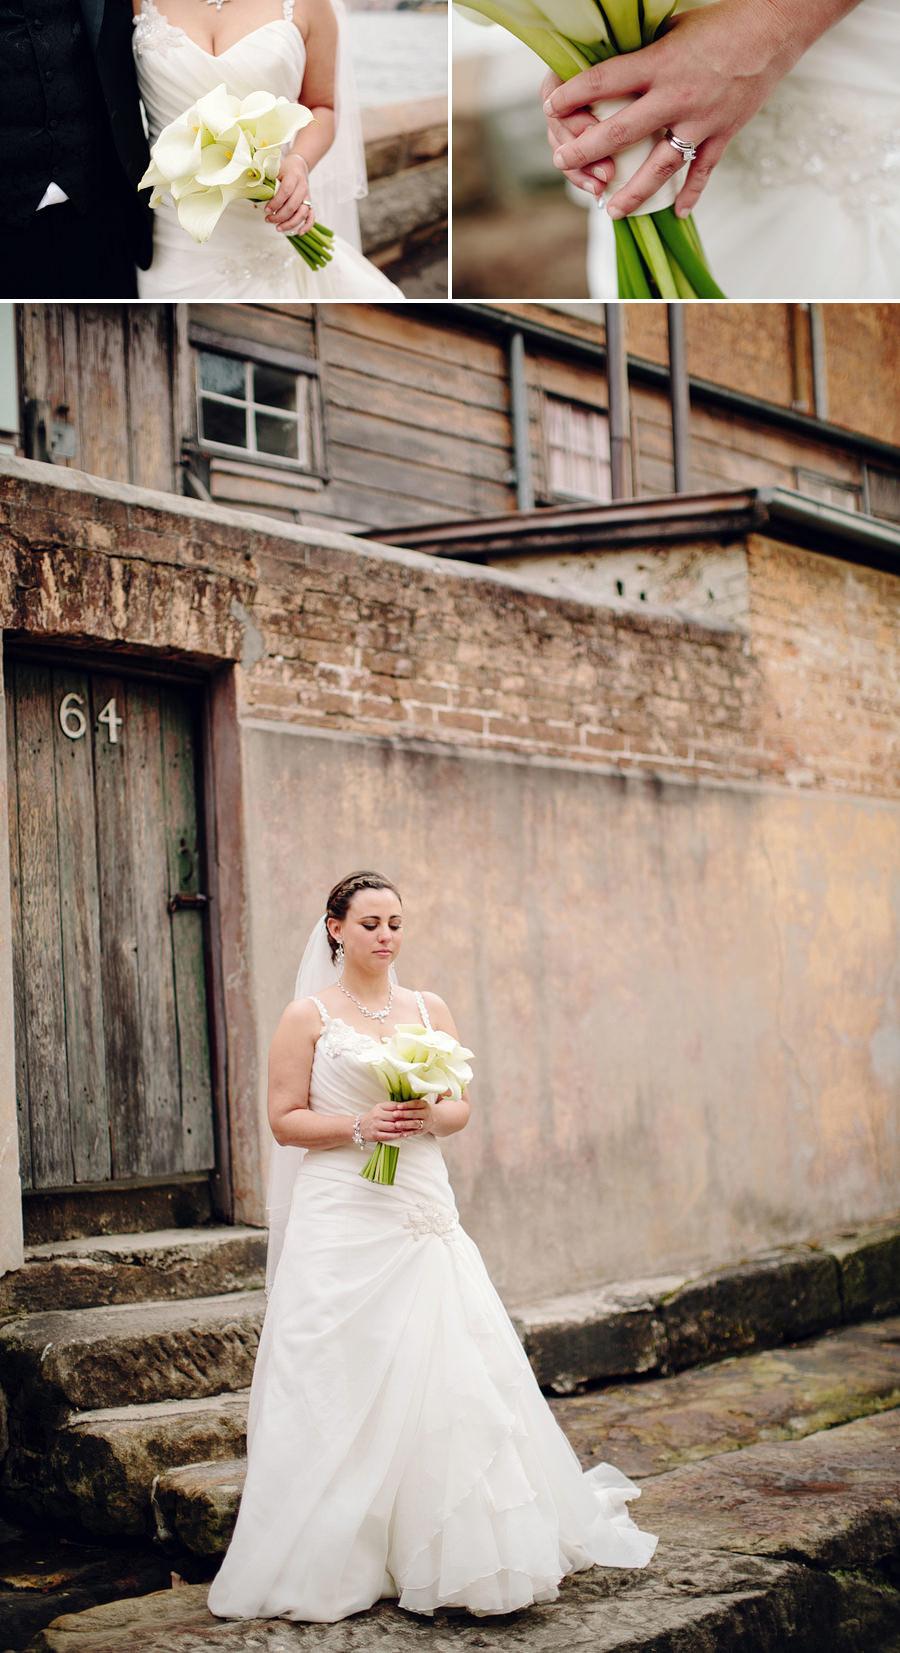 The Rocks Wedding Photographer : Bride portrait